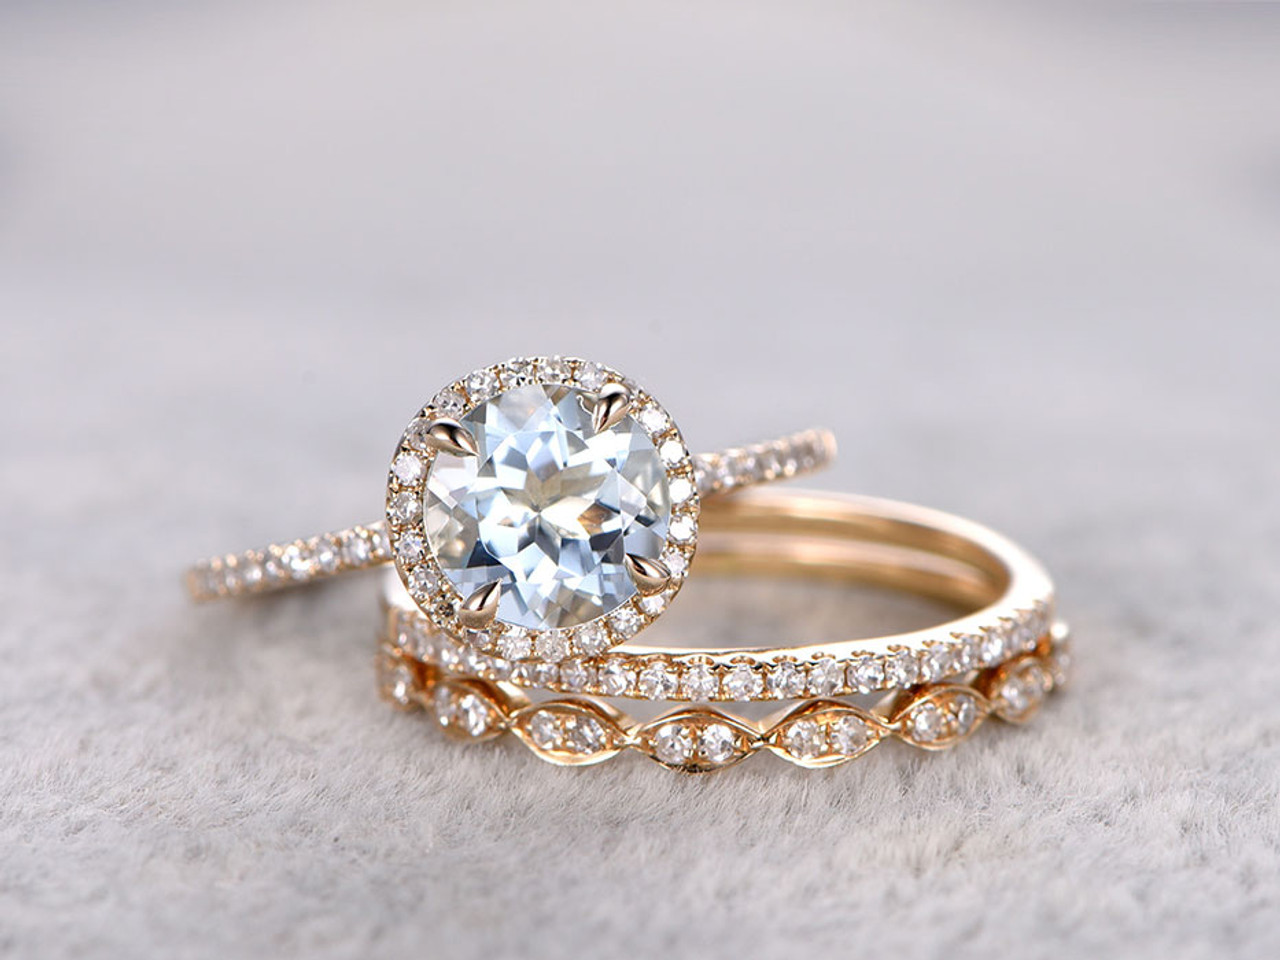 Wedding Ring Sets.3pcs Aquamarine Bridal Ring Set Diamond Wedding Band Yellow Gold Art Deco Thin Stacking Matching 14k 18k